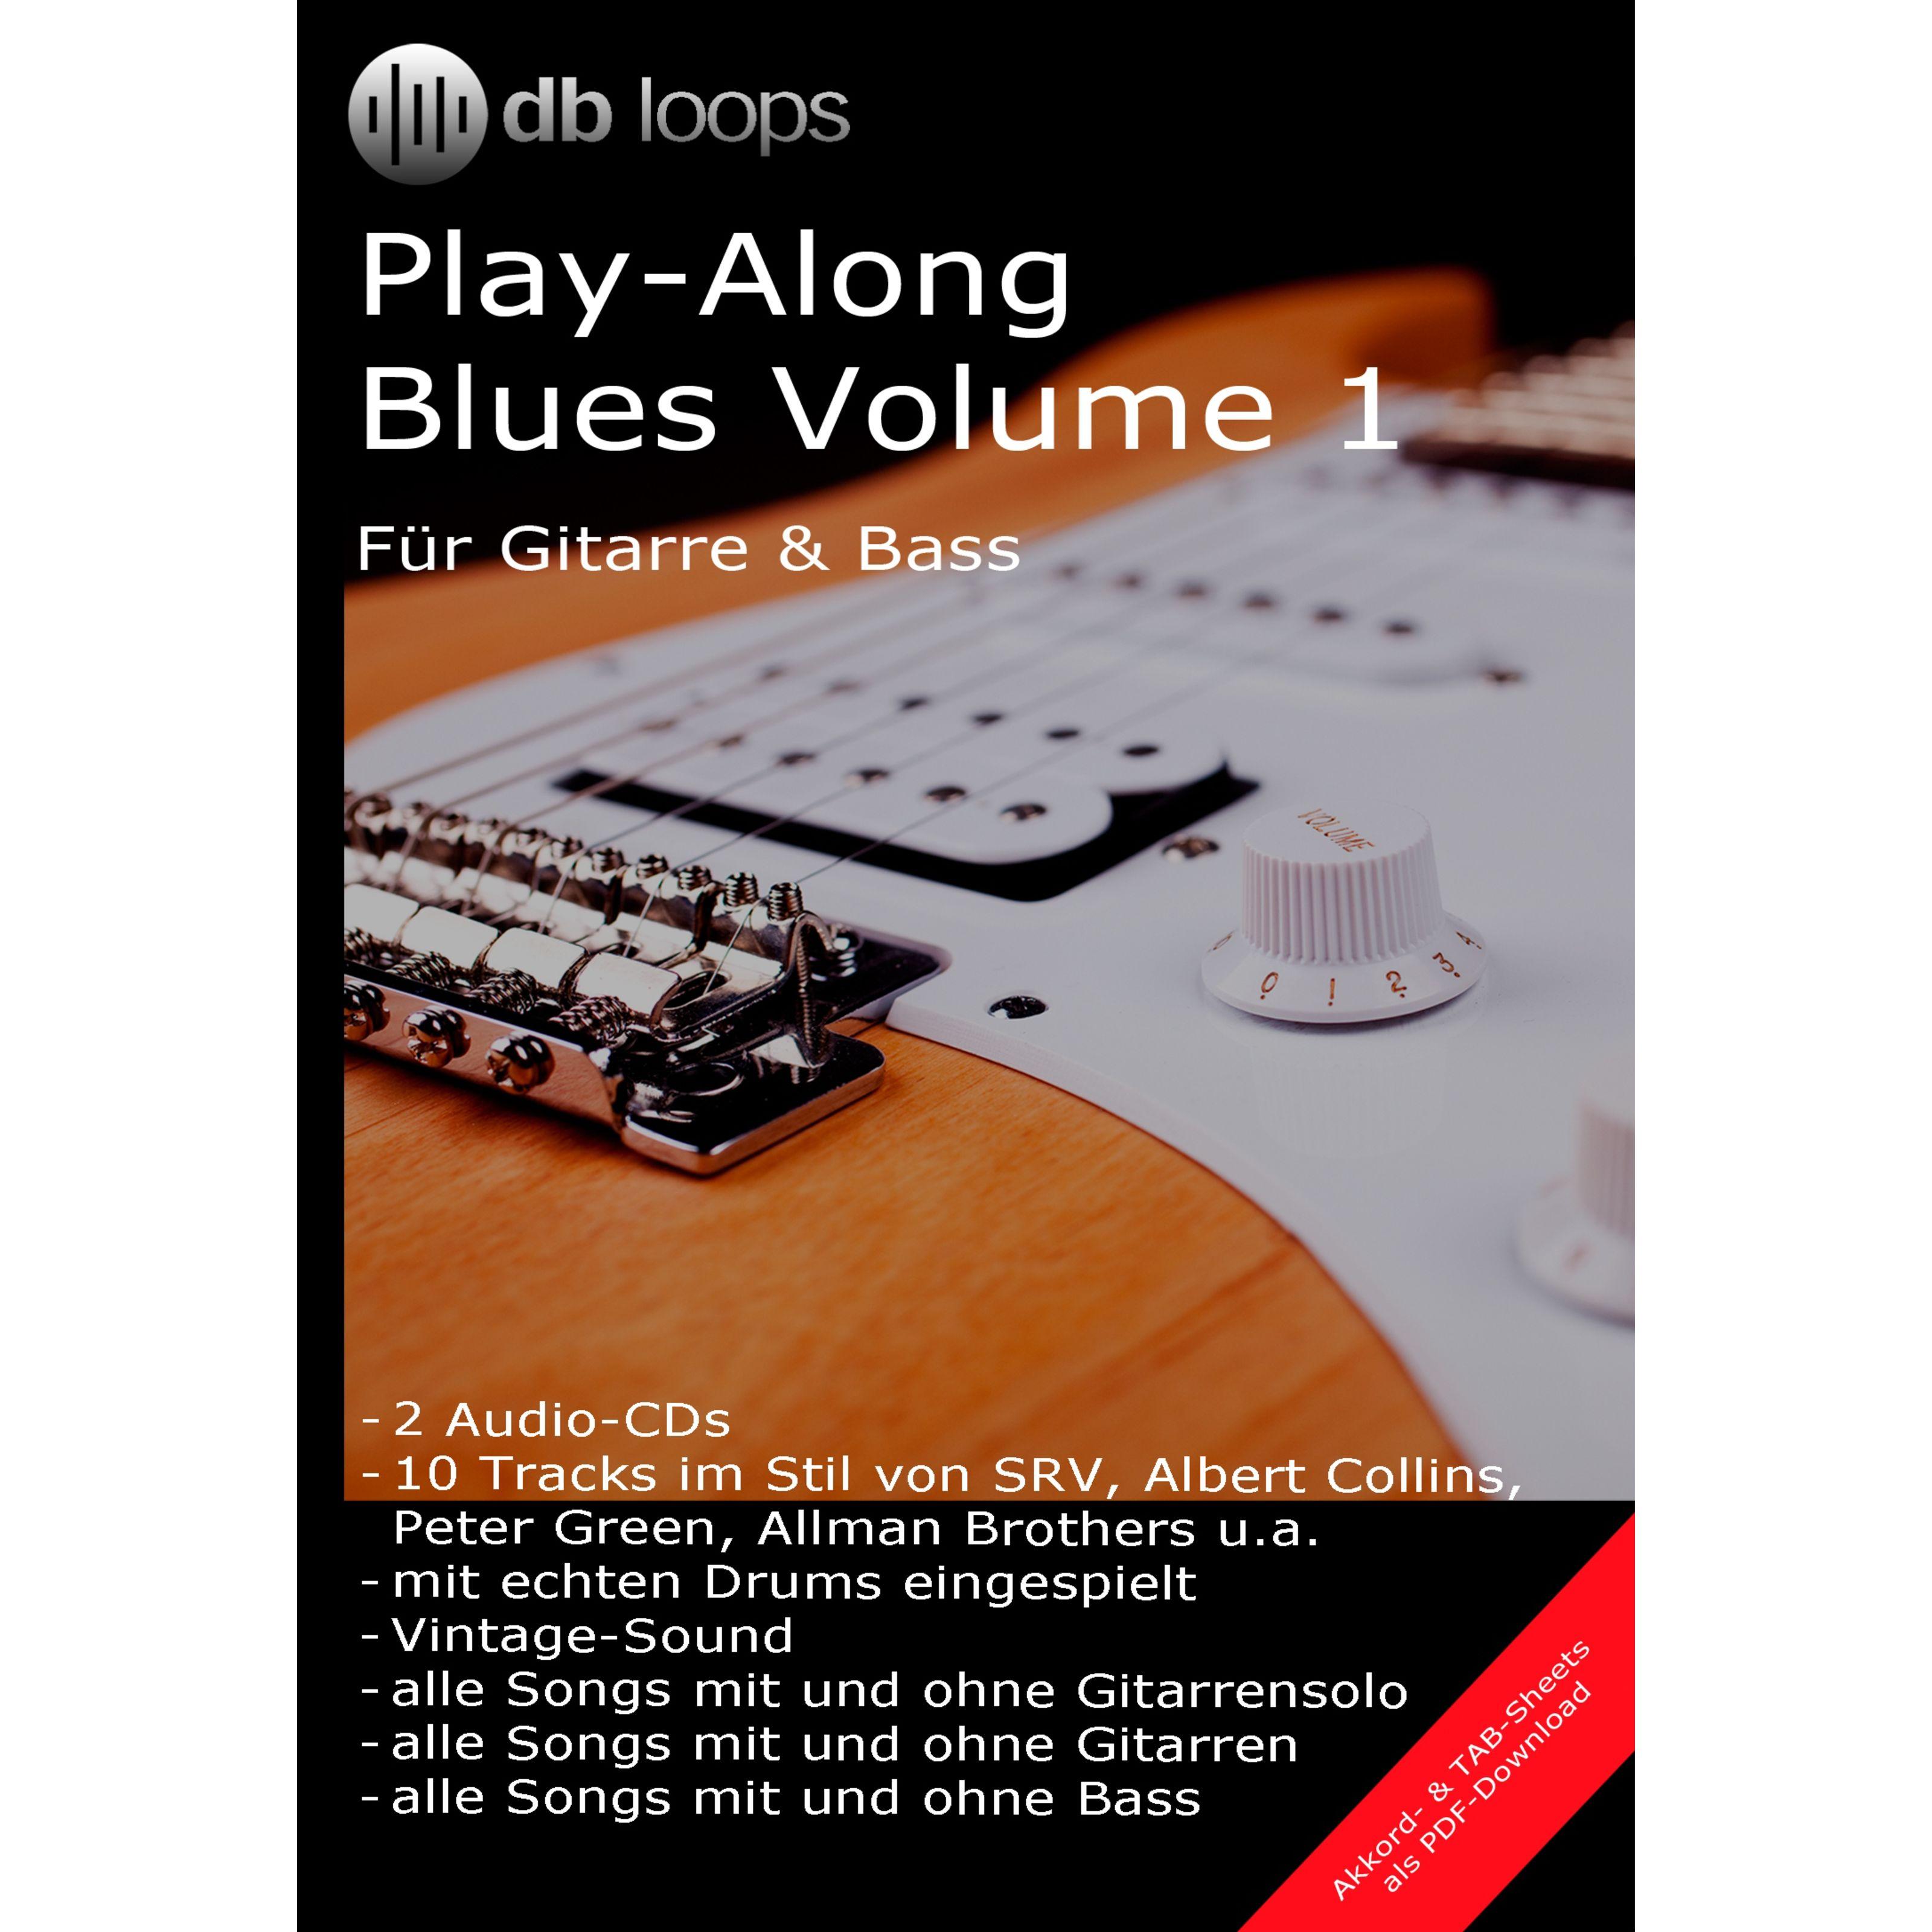 db loops - Blues - Volume 1 Gitarre Playalong 1-001